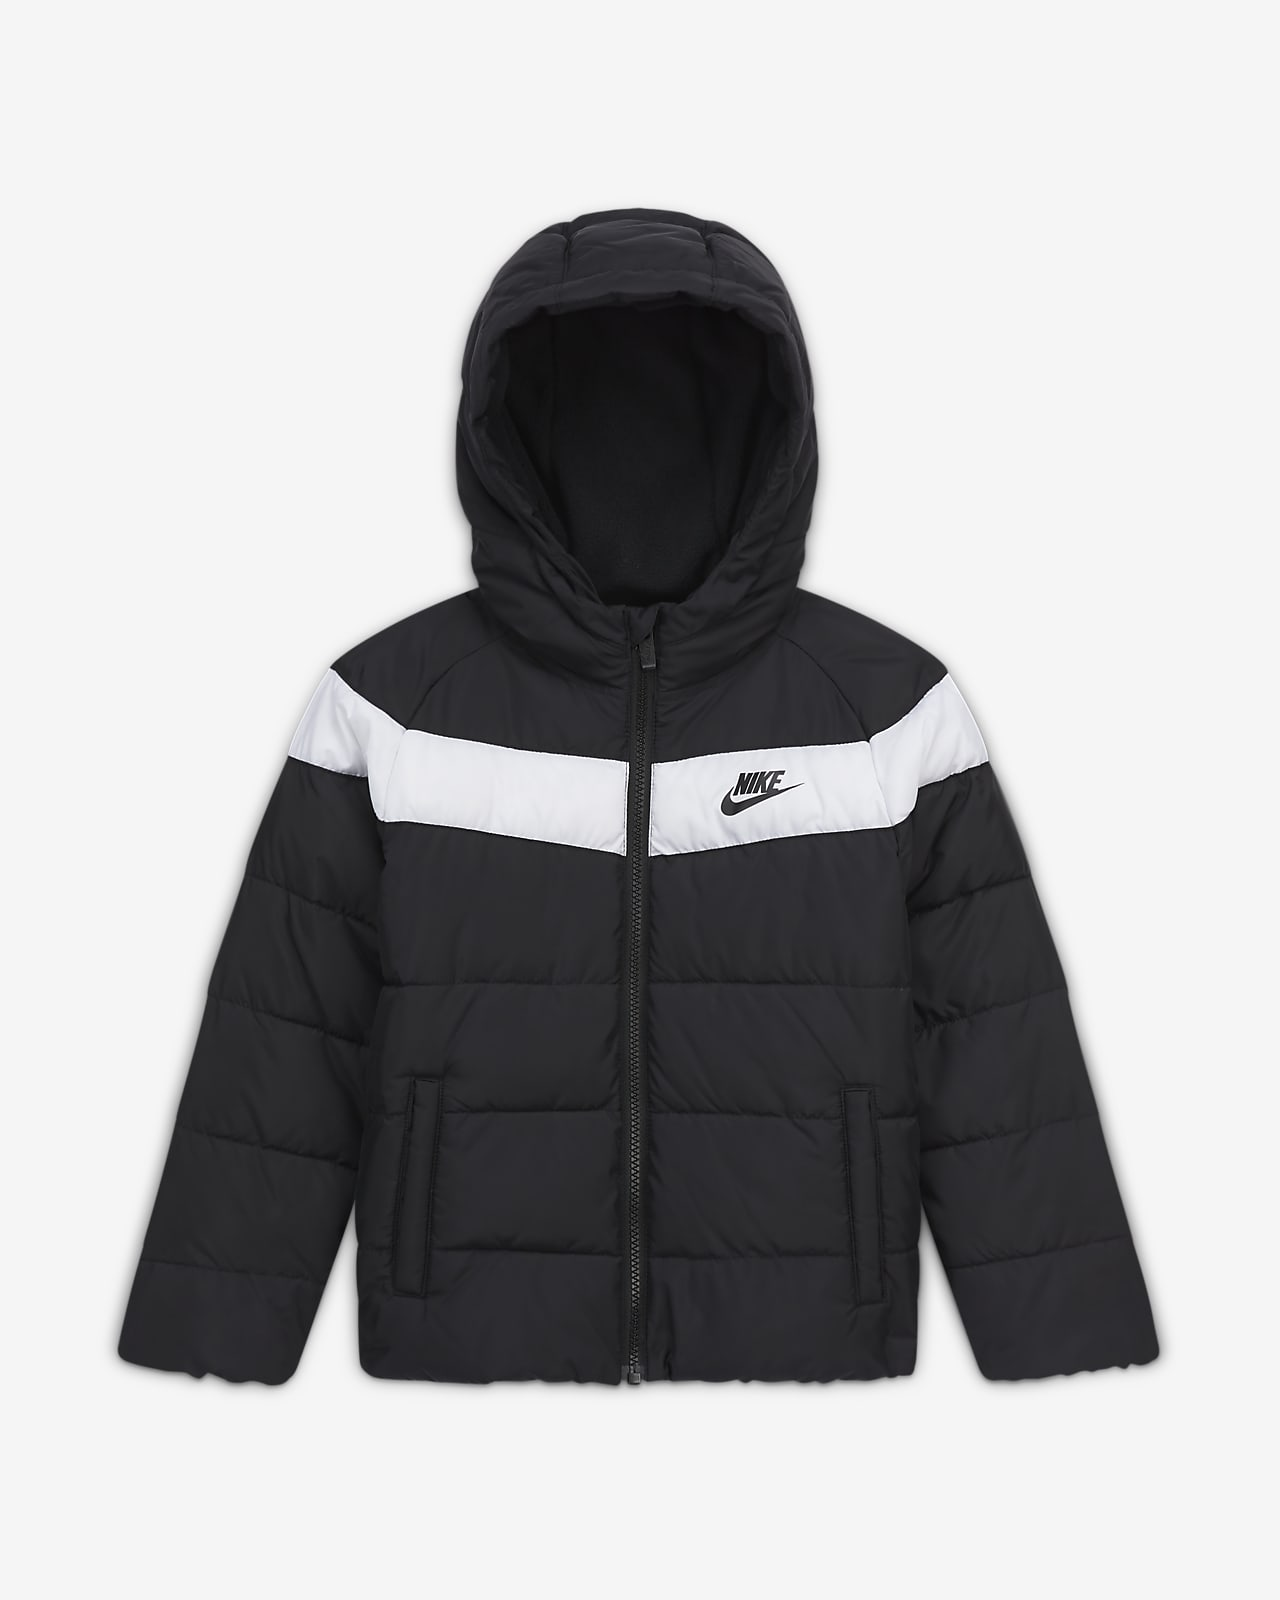 Nike Puffer Jacke für jüngere Kinder